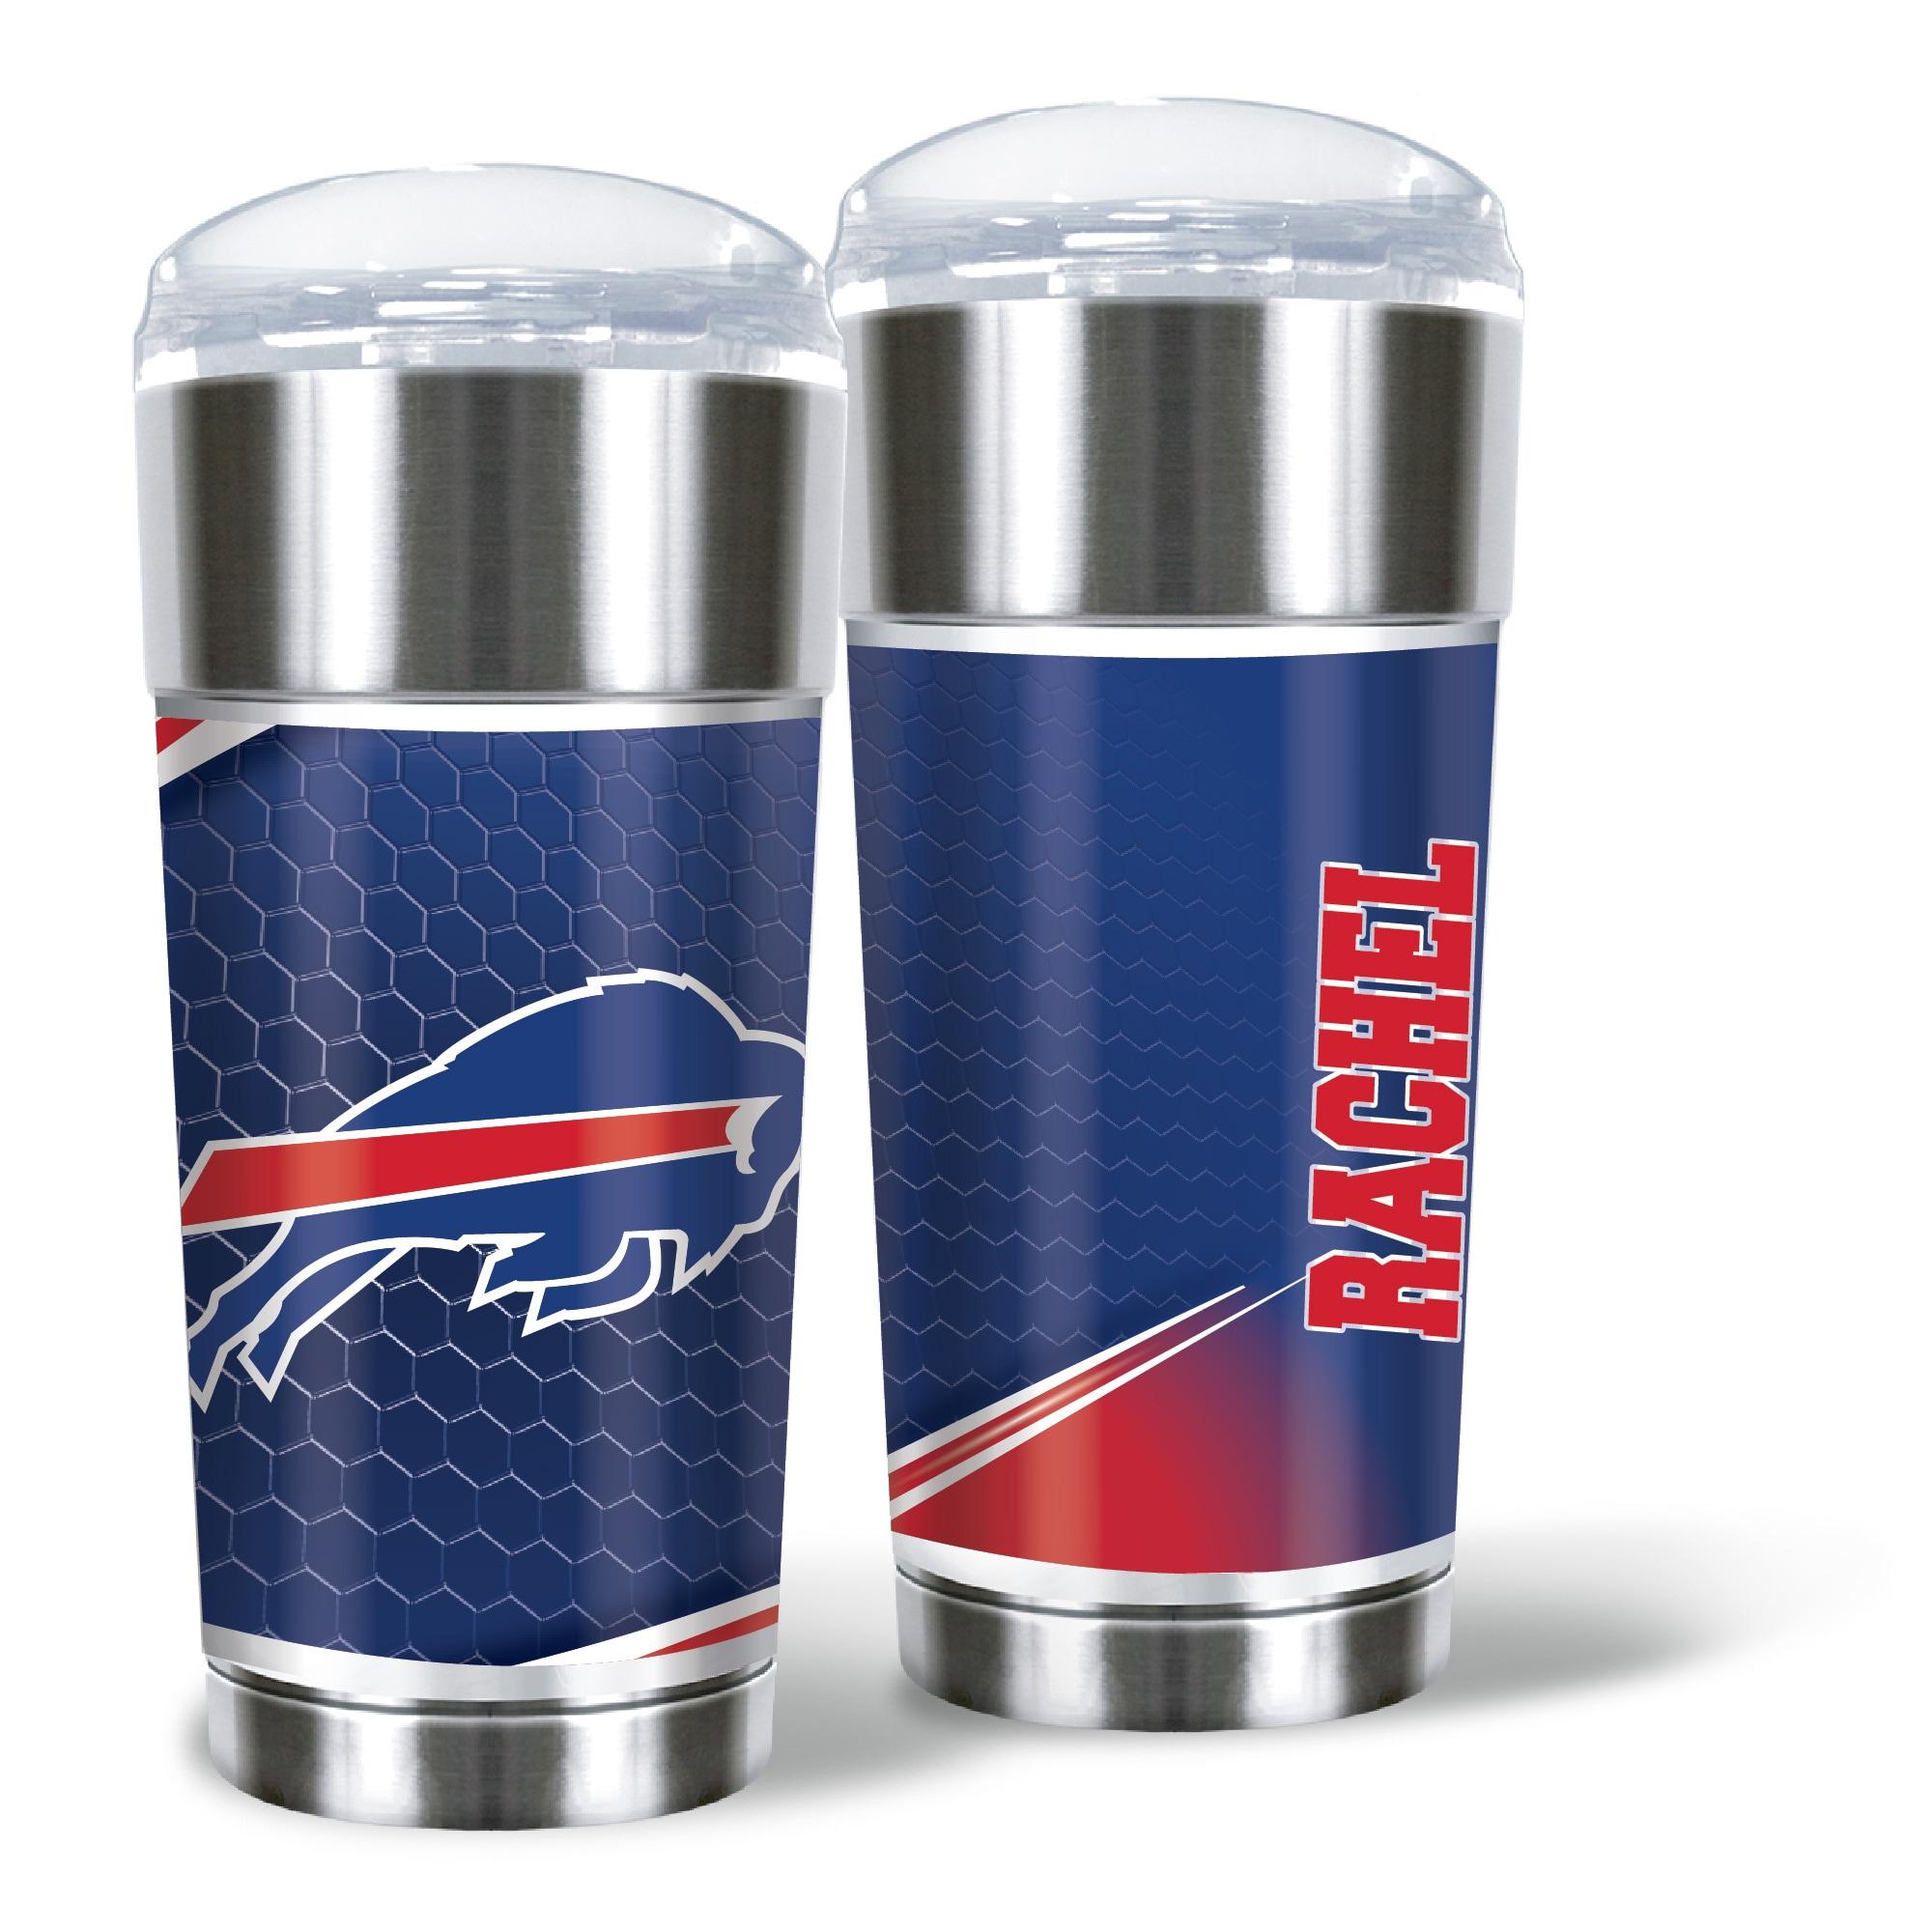 Buffalo Bills 24oz. Personalized Eagle Tumbler